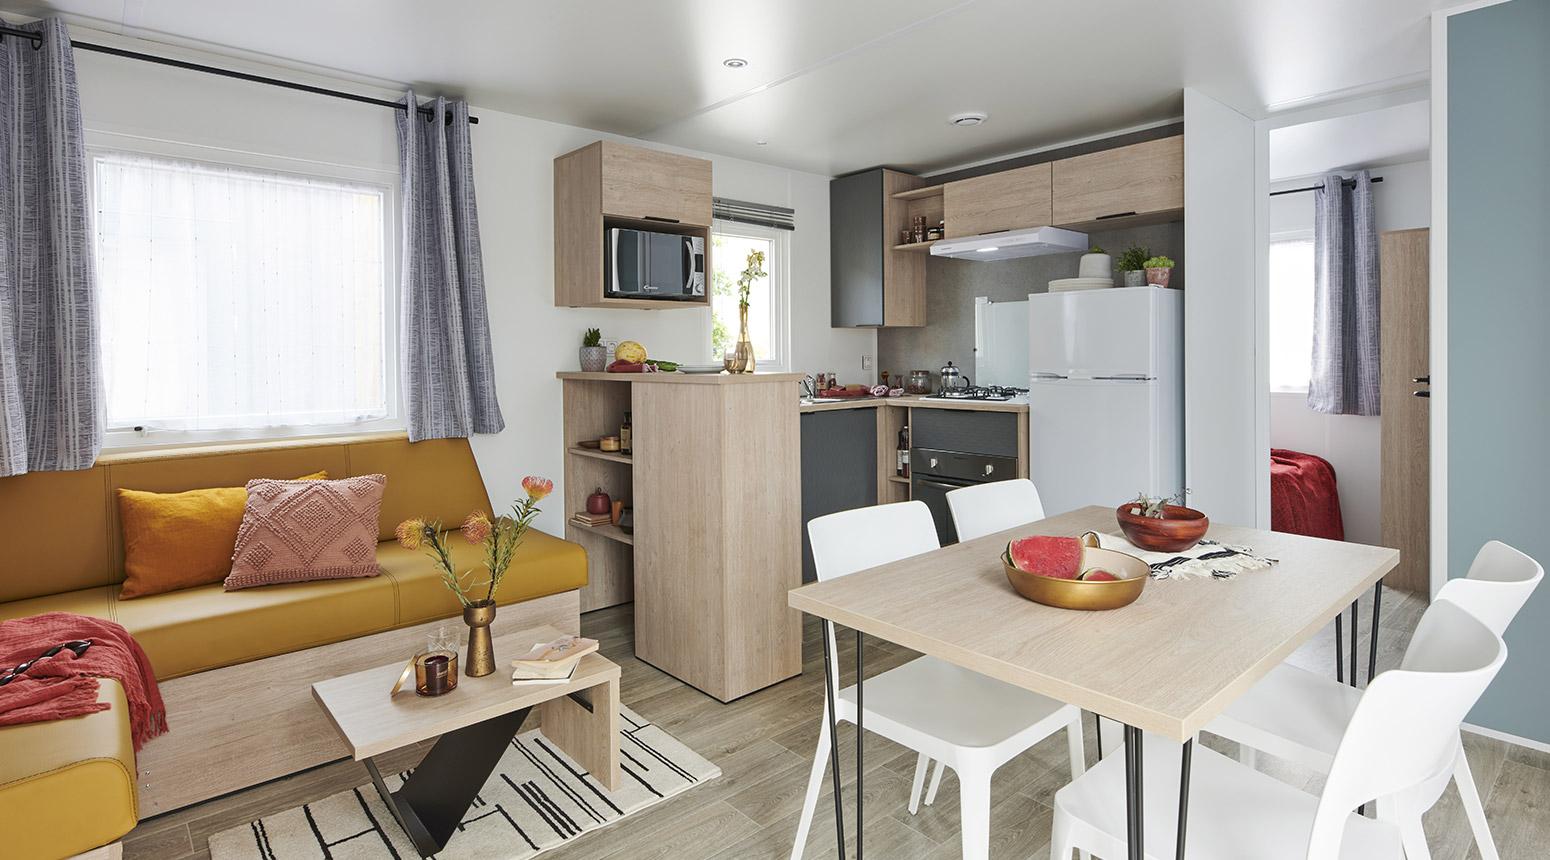 gamme 2017 lodge 872 rapidhome mobil home. Black Bedroom Furniture Sets. Home Design Ideas